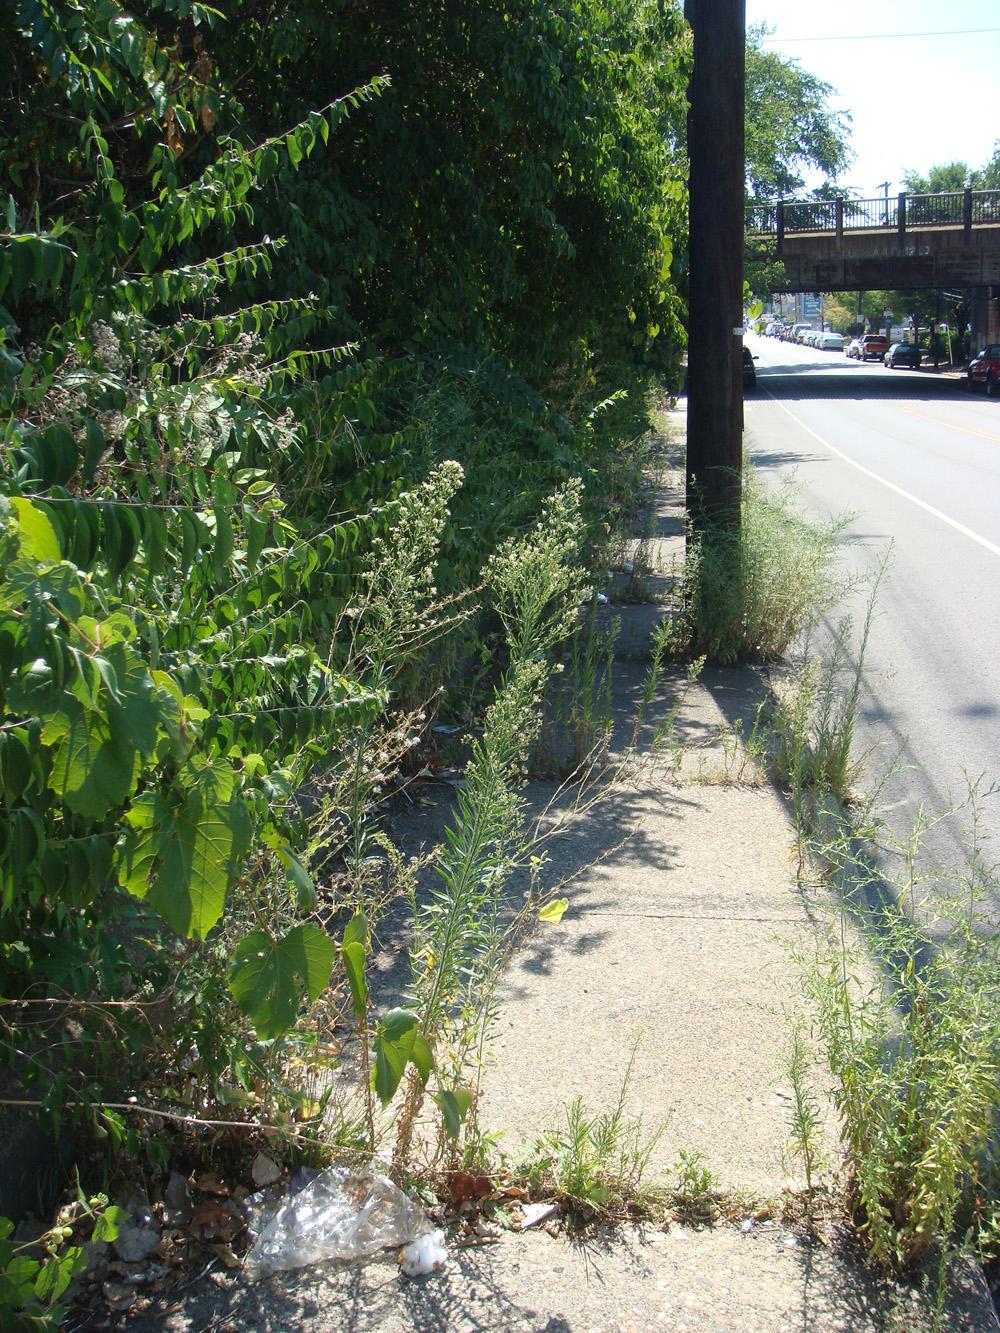 Broken Sidewalk on Spring Street